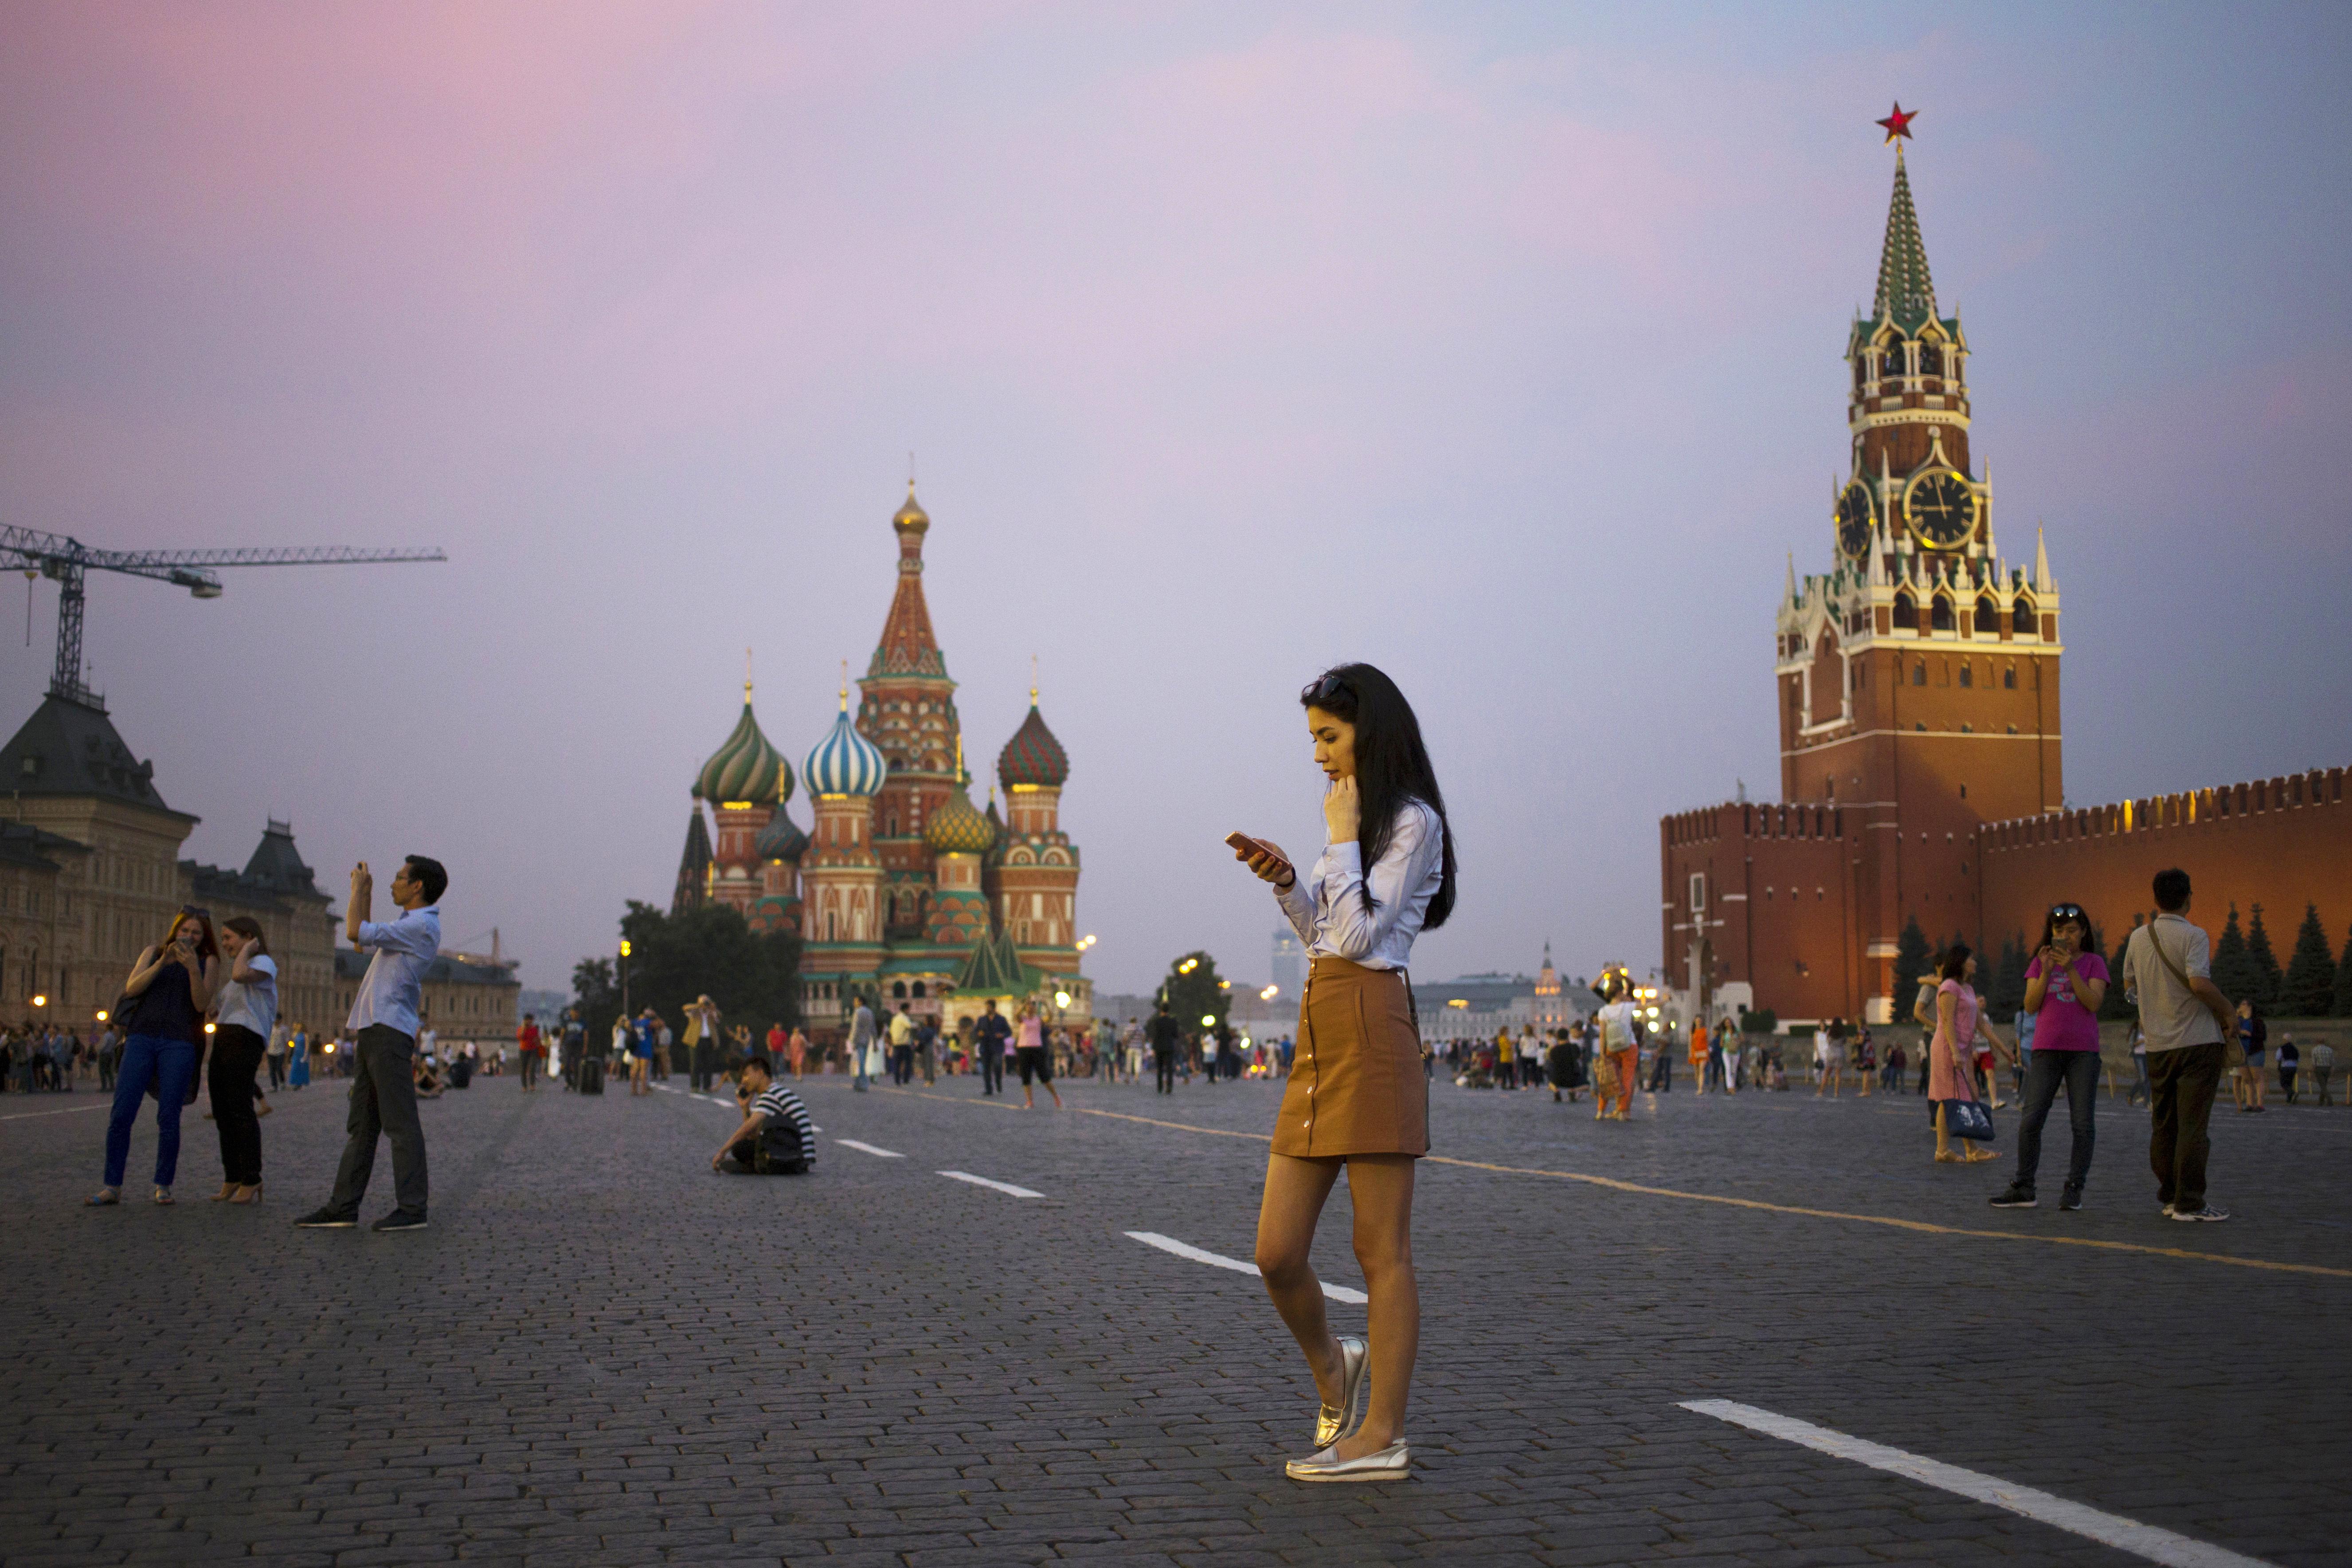 RFE/RL denounces latest Kremlin efforts to force RFE/RL out of Russia